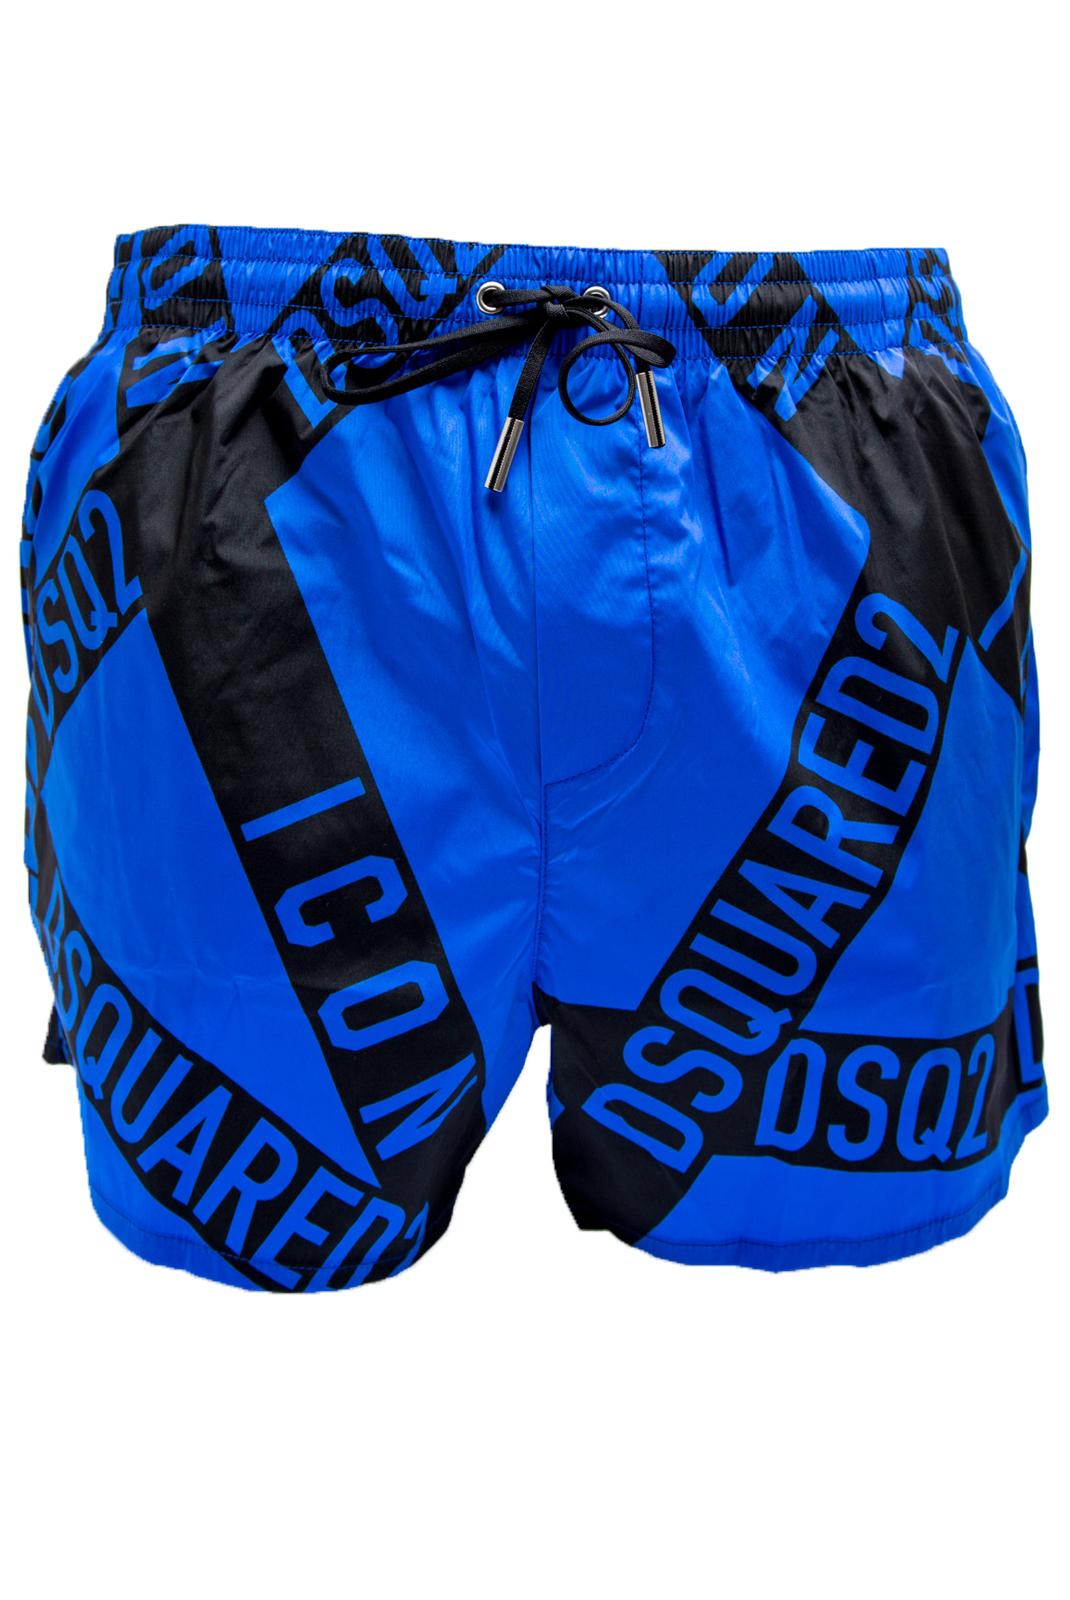 Shorts de bain  Dsquared2 D7B642540 33046 BLEU